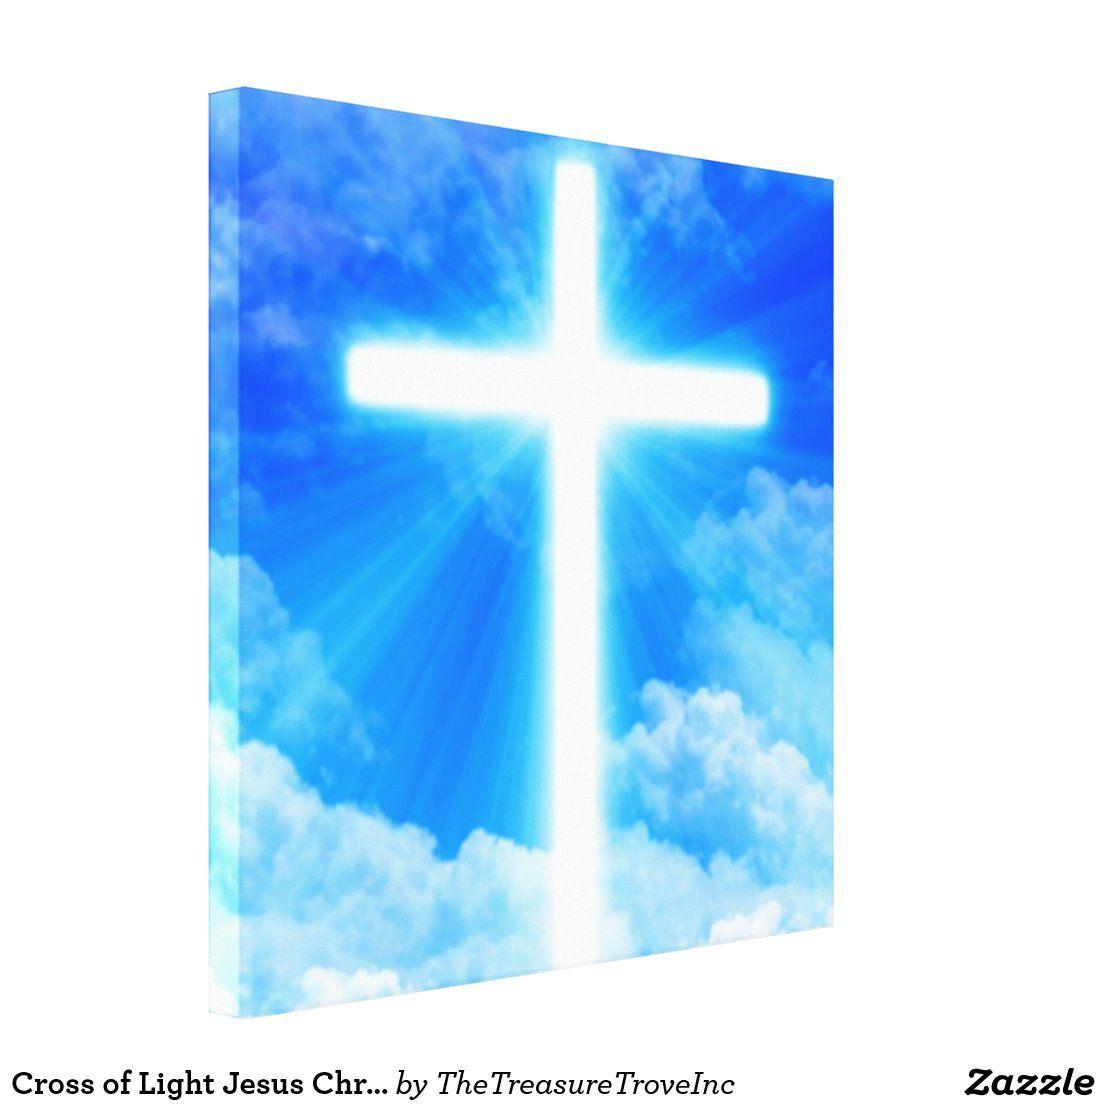 Cross Of Light Jesus Christ Customizable Christian Canvas Print Zazzle Com In 2020 Jesus Christ Jesus Christ Cross Christian Messages